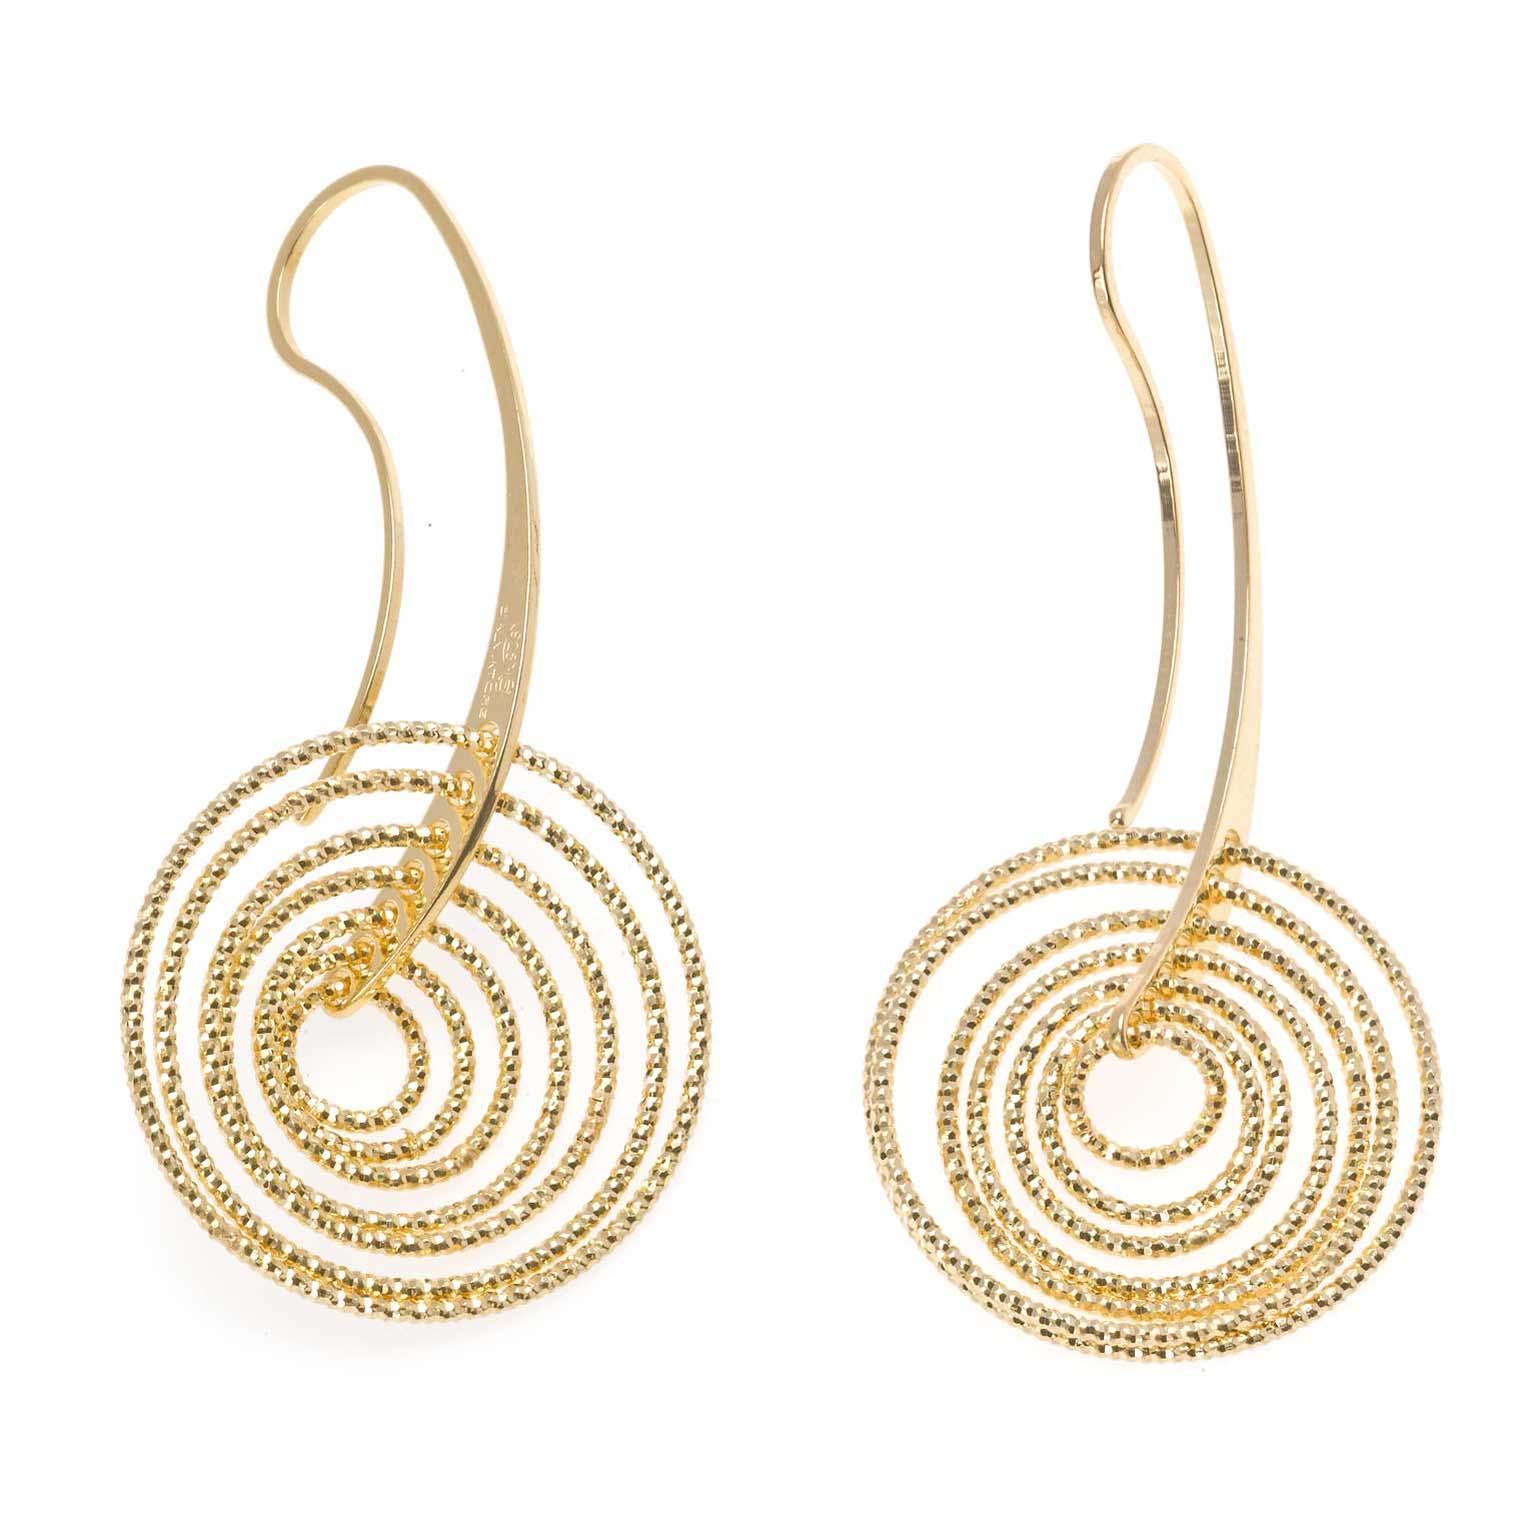 Pendientes plata Salvatore aros  diamantados dorados